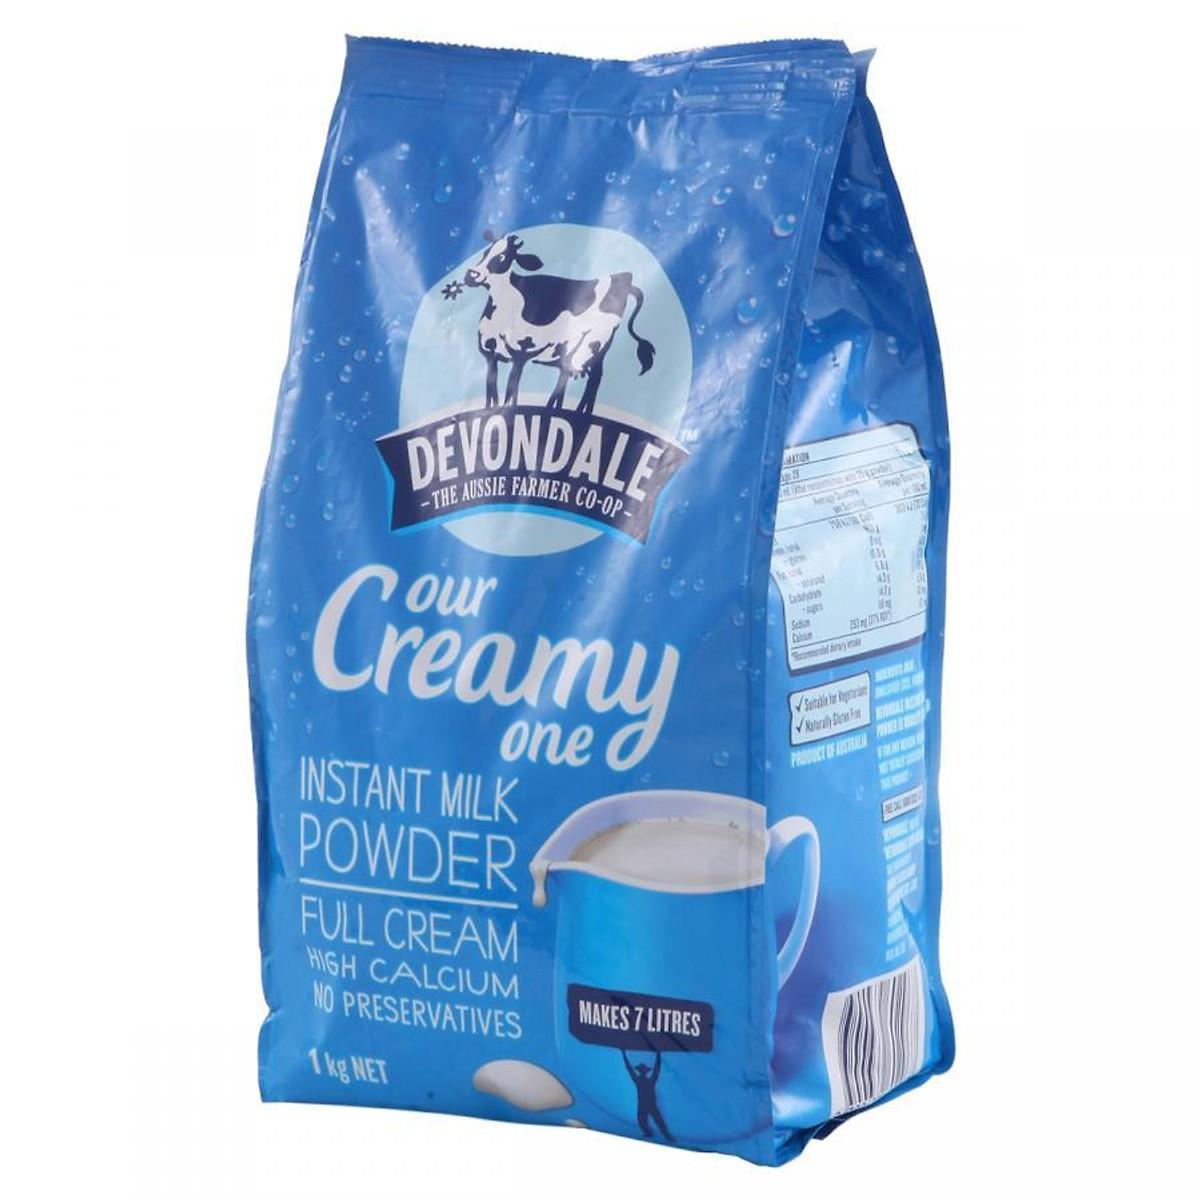 Chọn sữa tươi nguyên kem Vinamilk hay Devondale? 3